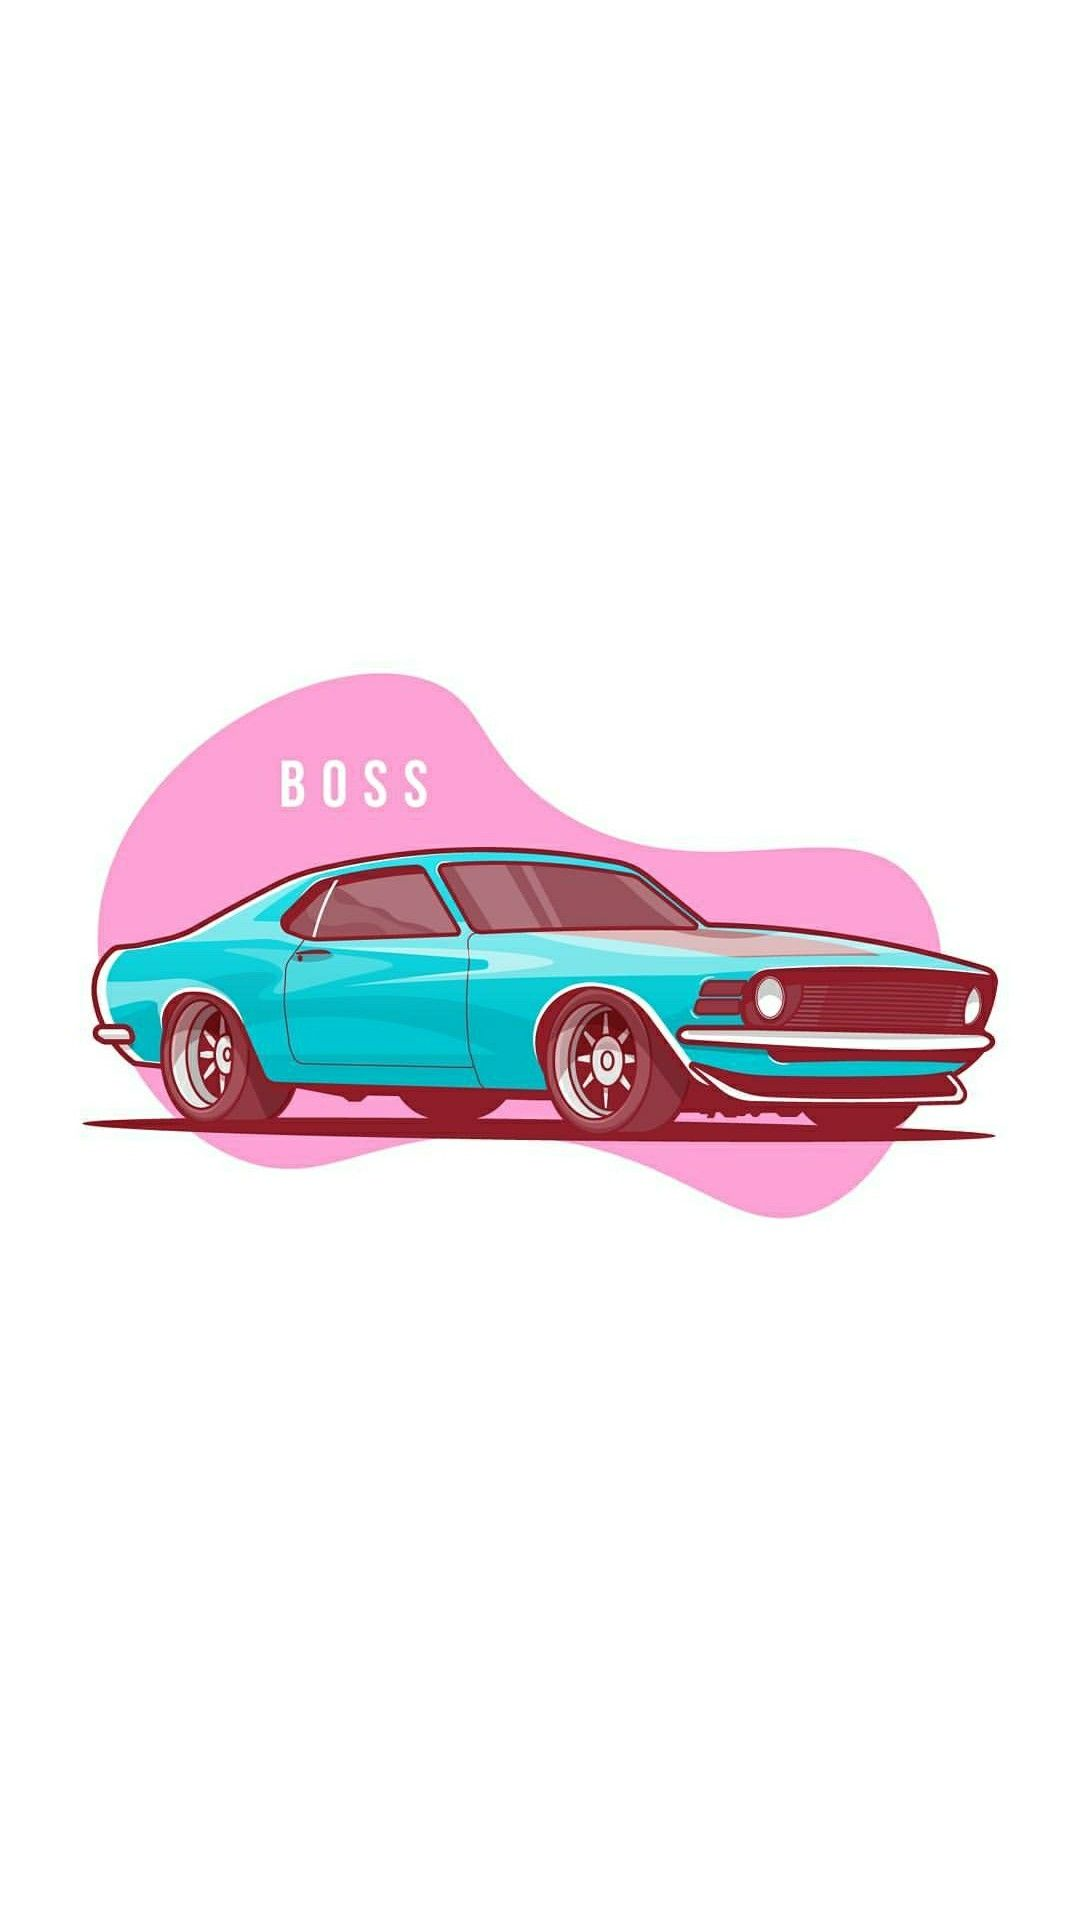 Pin De Robdier Burgos En Animasi Coches Retro Ilustracion De Coches Dibujos De Autos